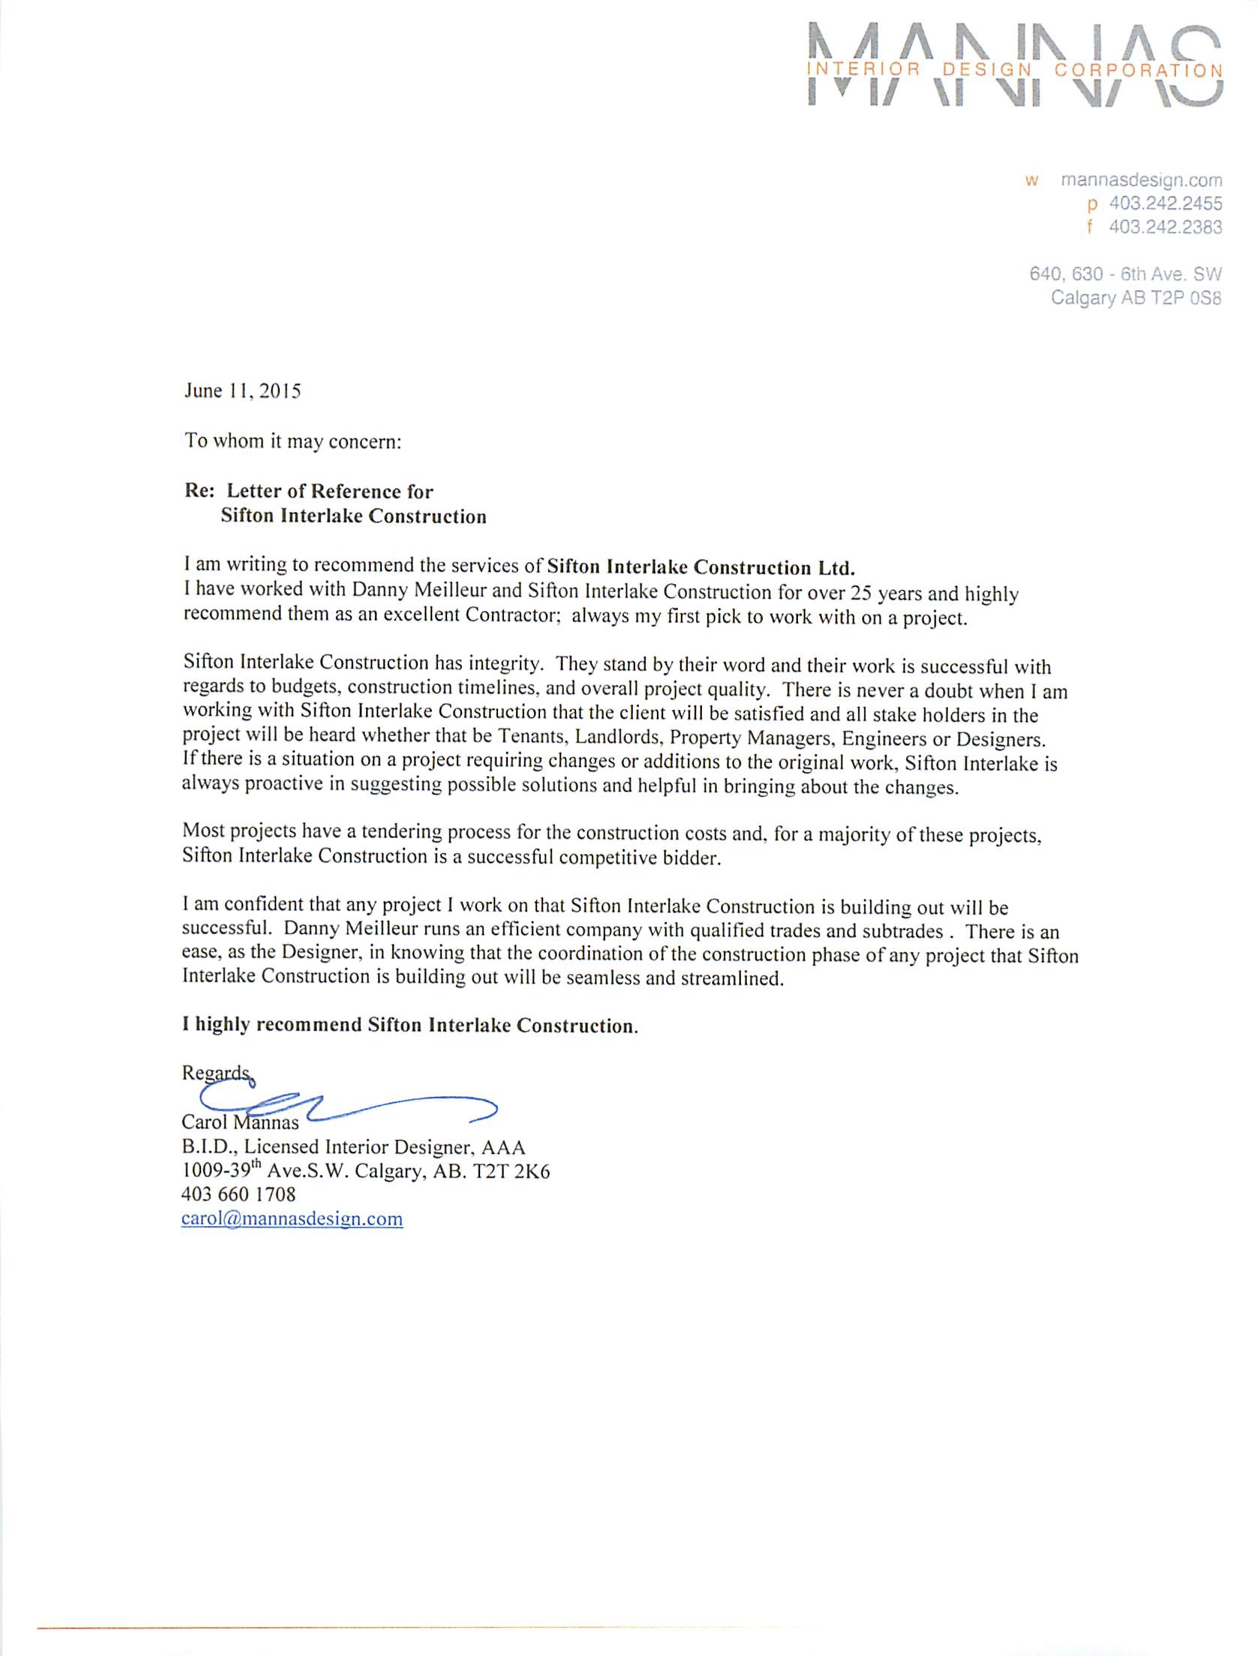 Mannas Interior Design Corp Letter of Reference  Sifton Interlake Construction LTD